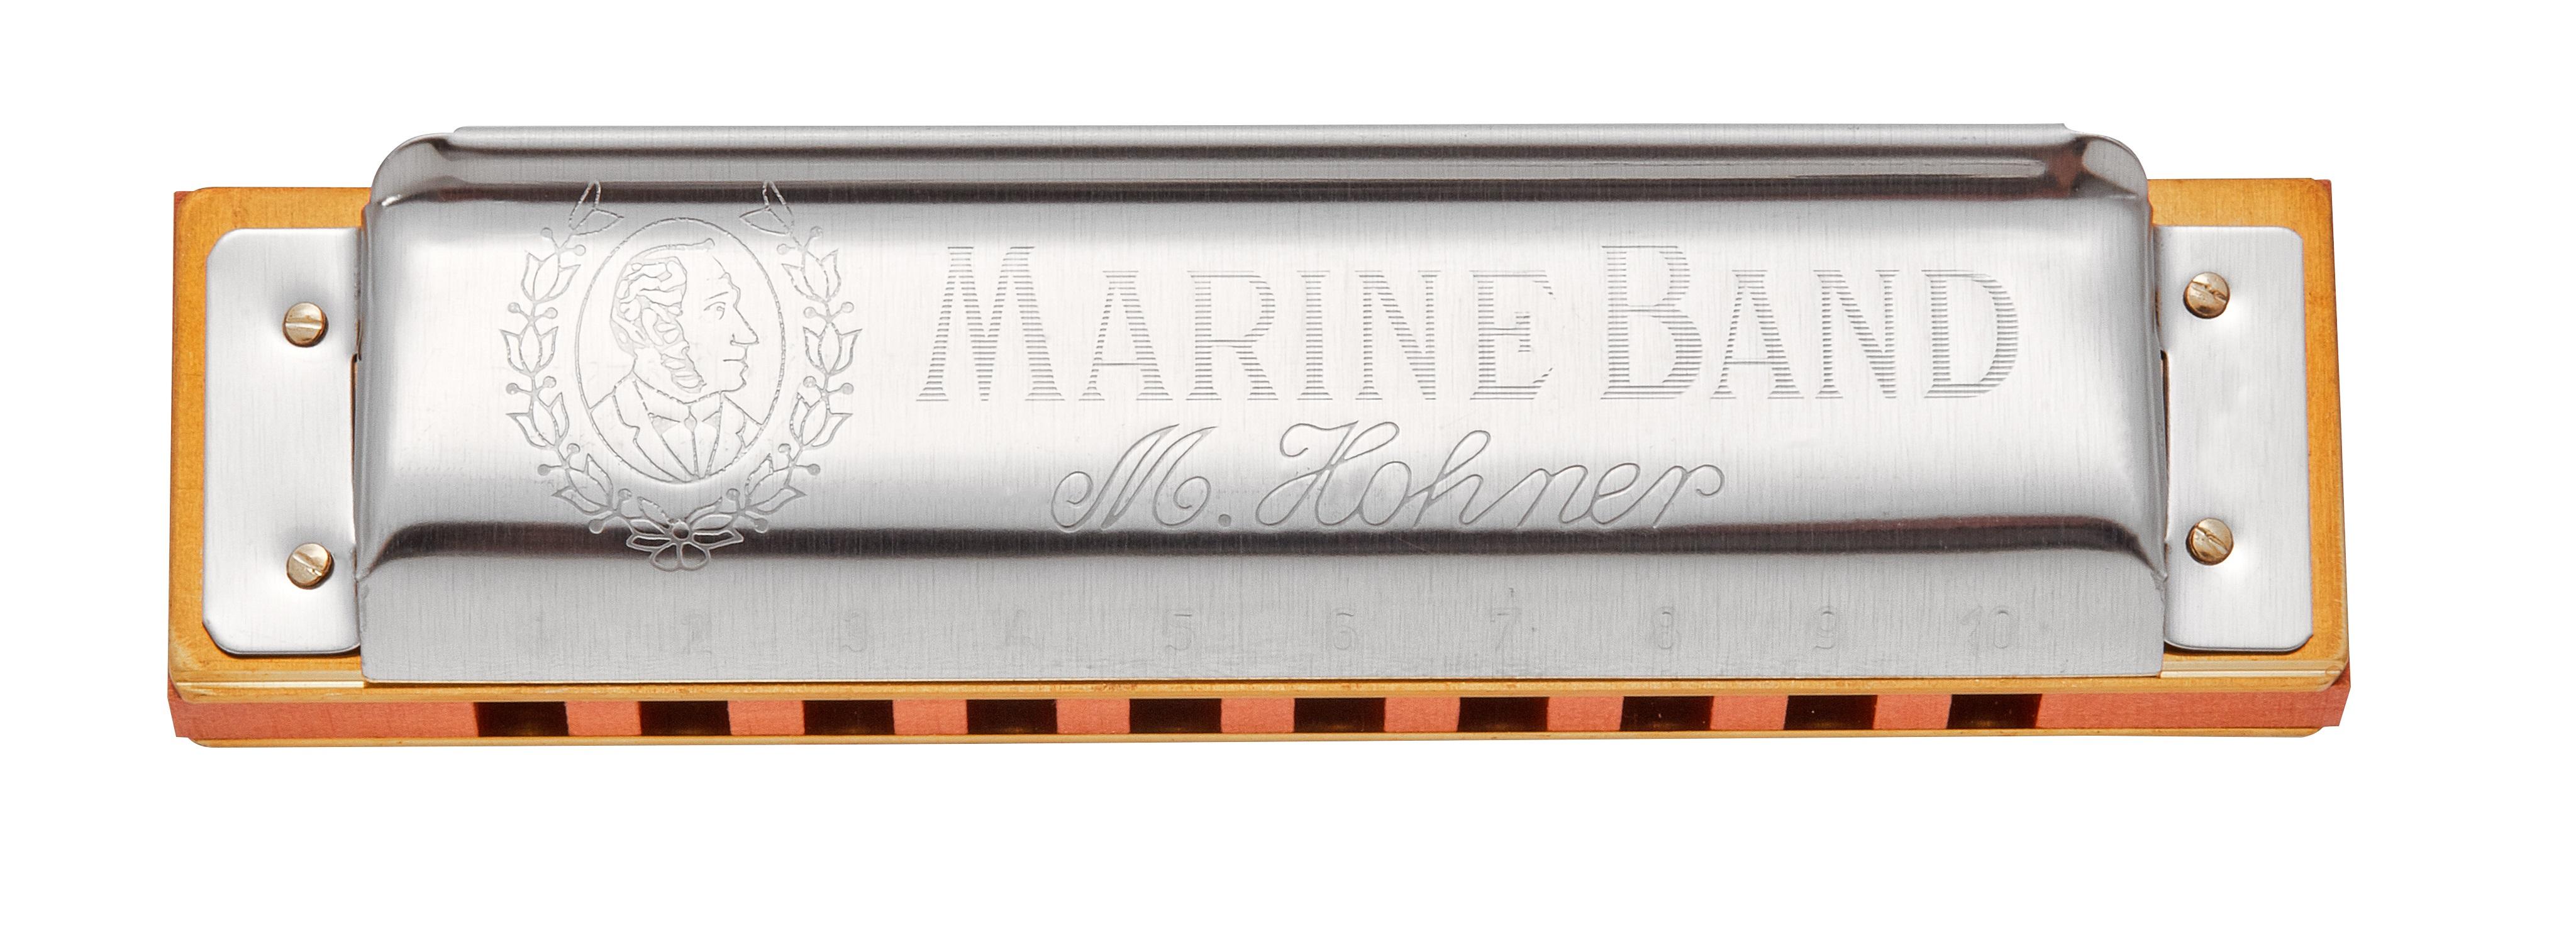 Hohner Marine Band 1896 E-major